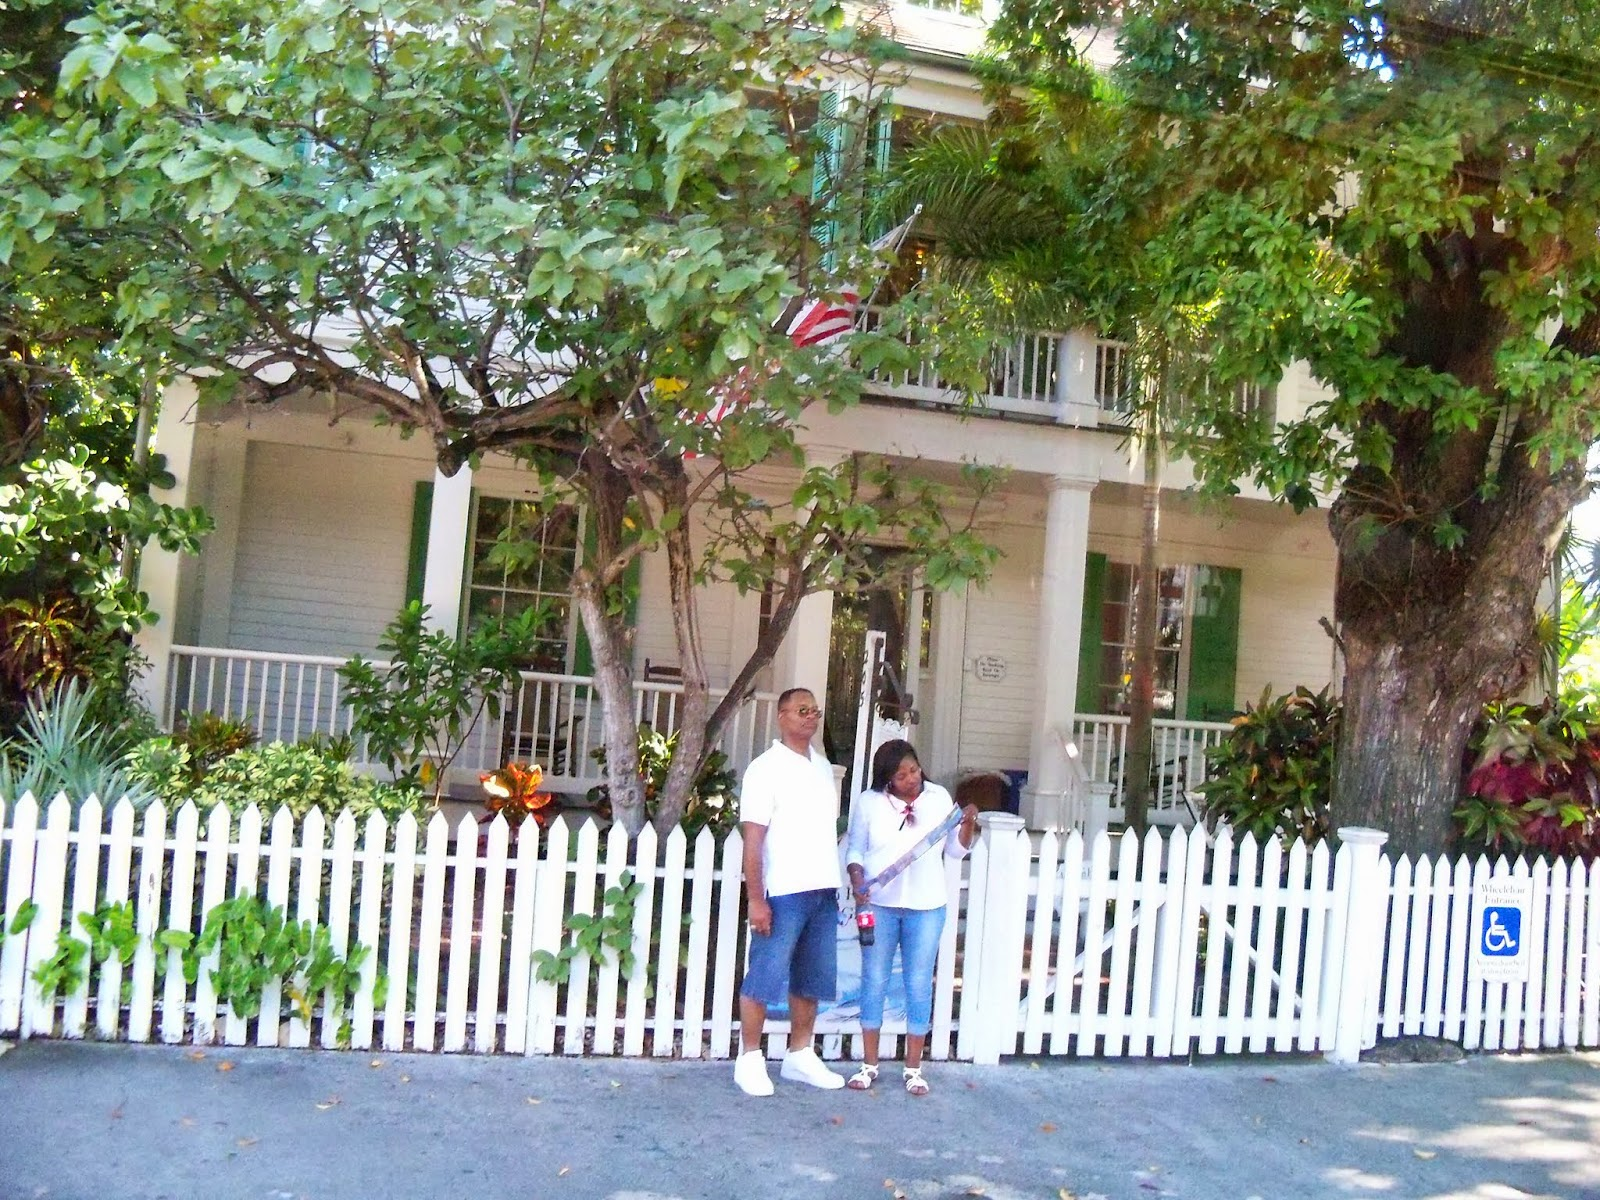 Key West Vacation - 116_5682.JPG